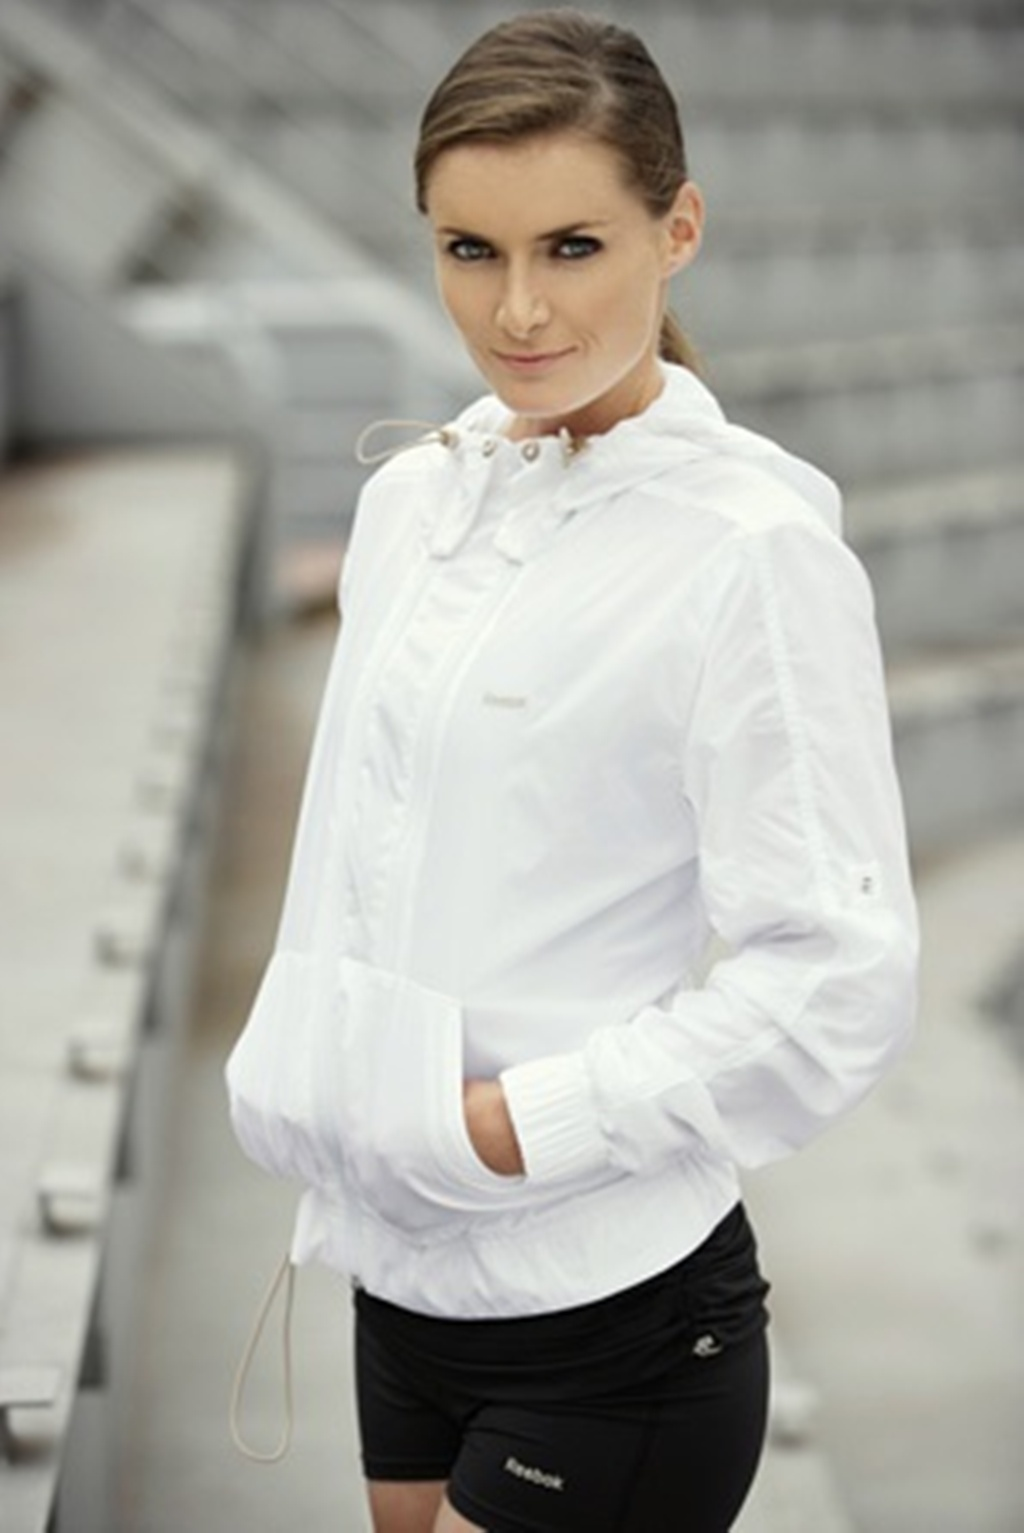 Iveta Benešová